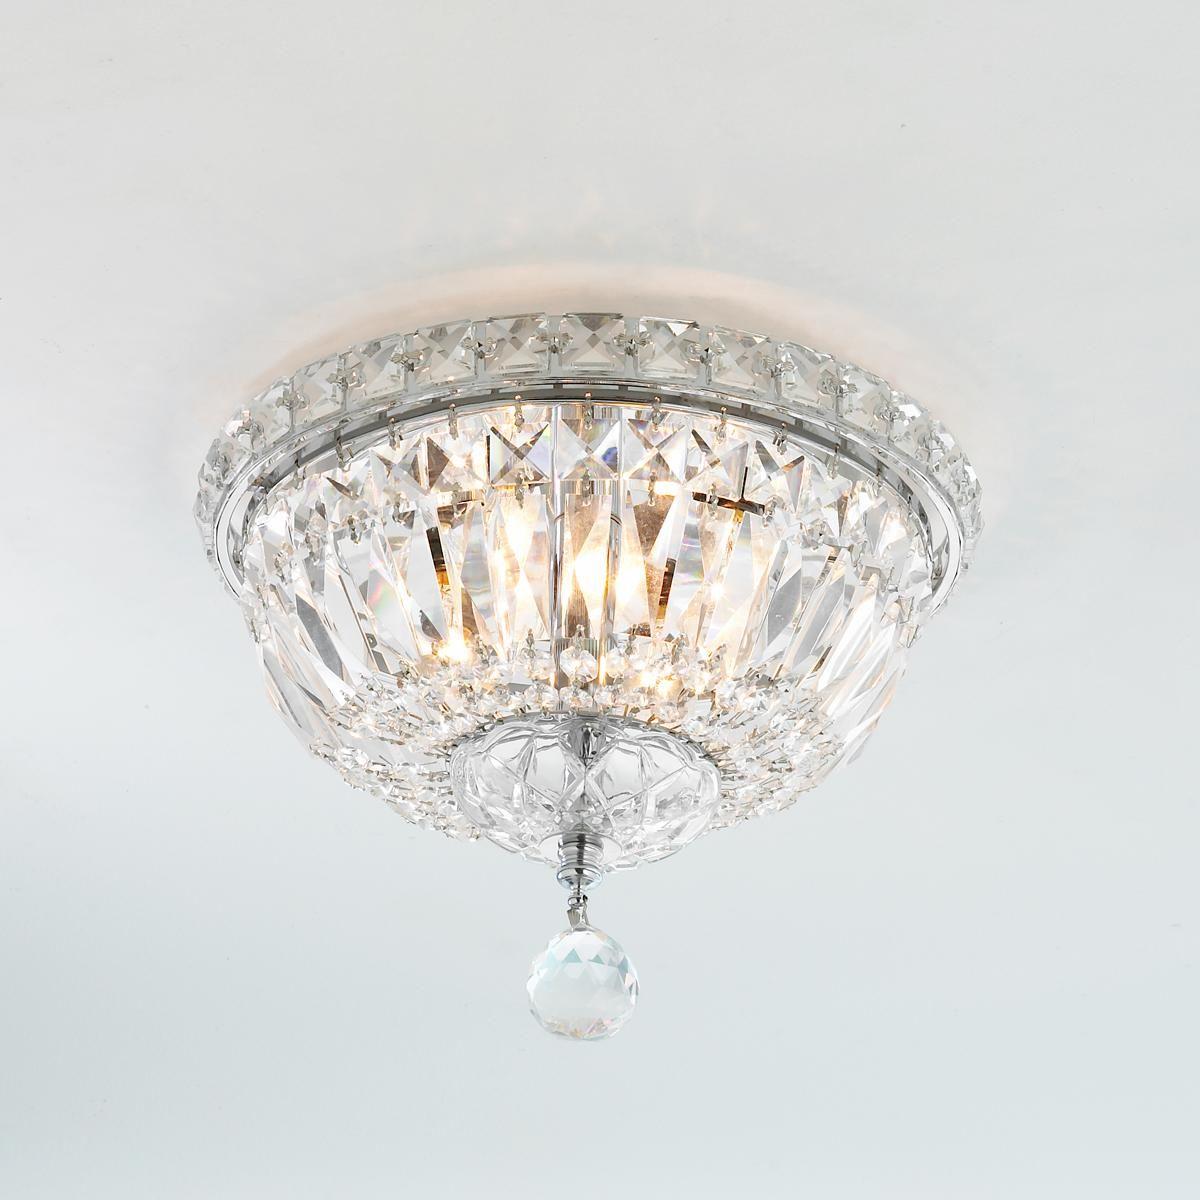 Foyer Light Small Crystal Basket Ceiling Light Andres